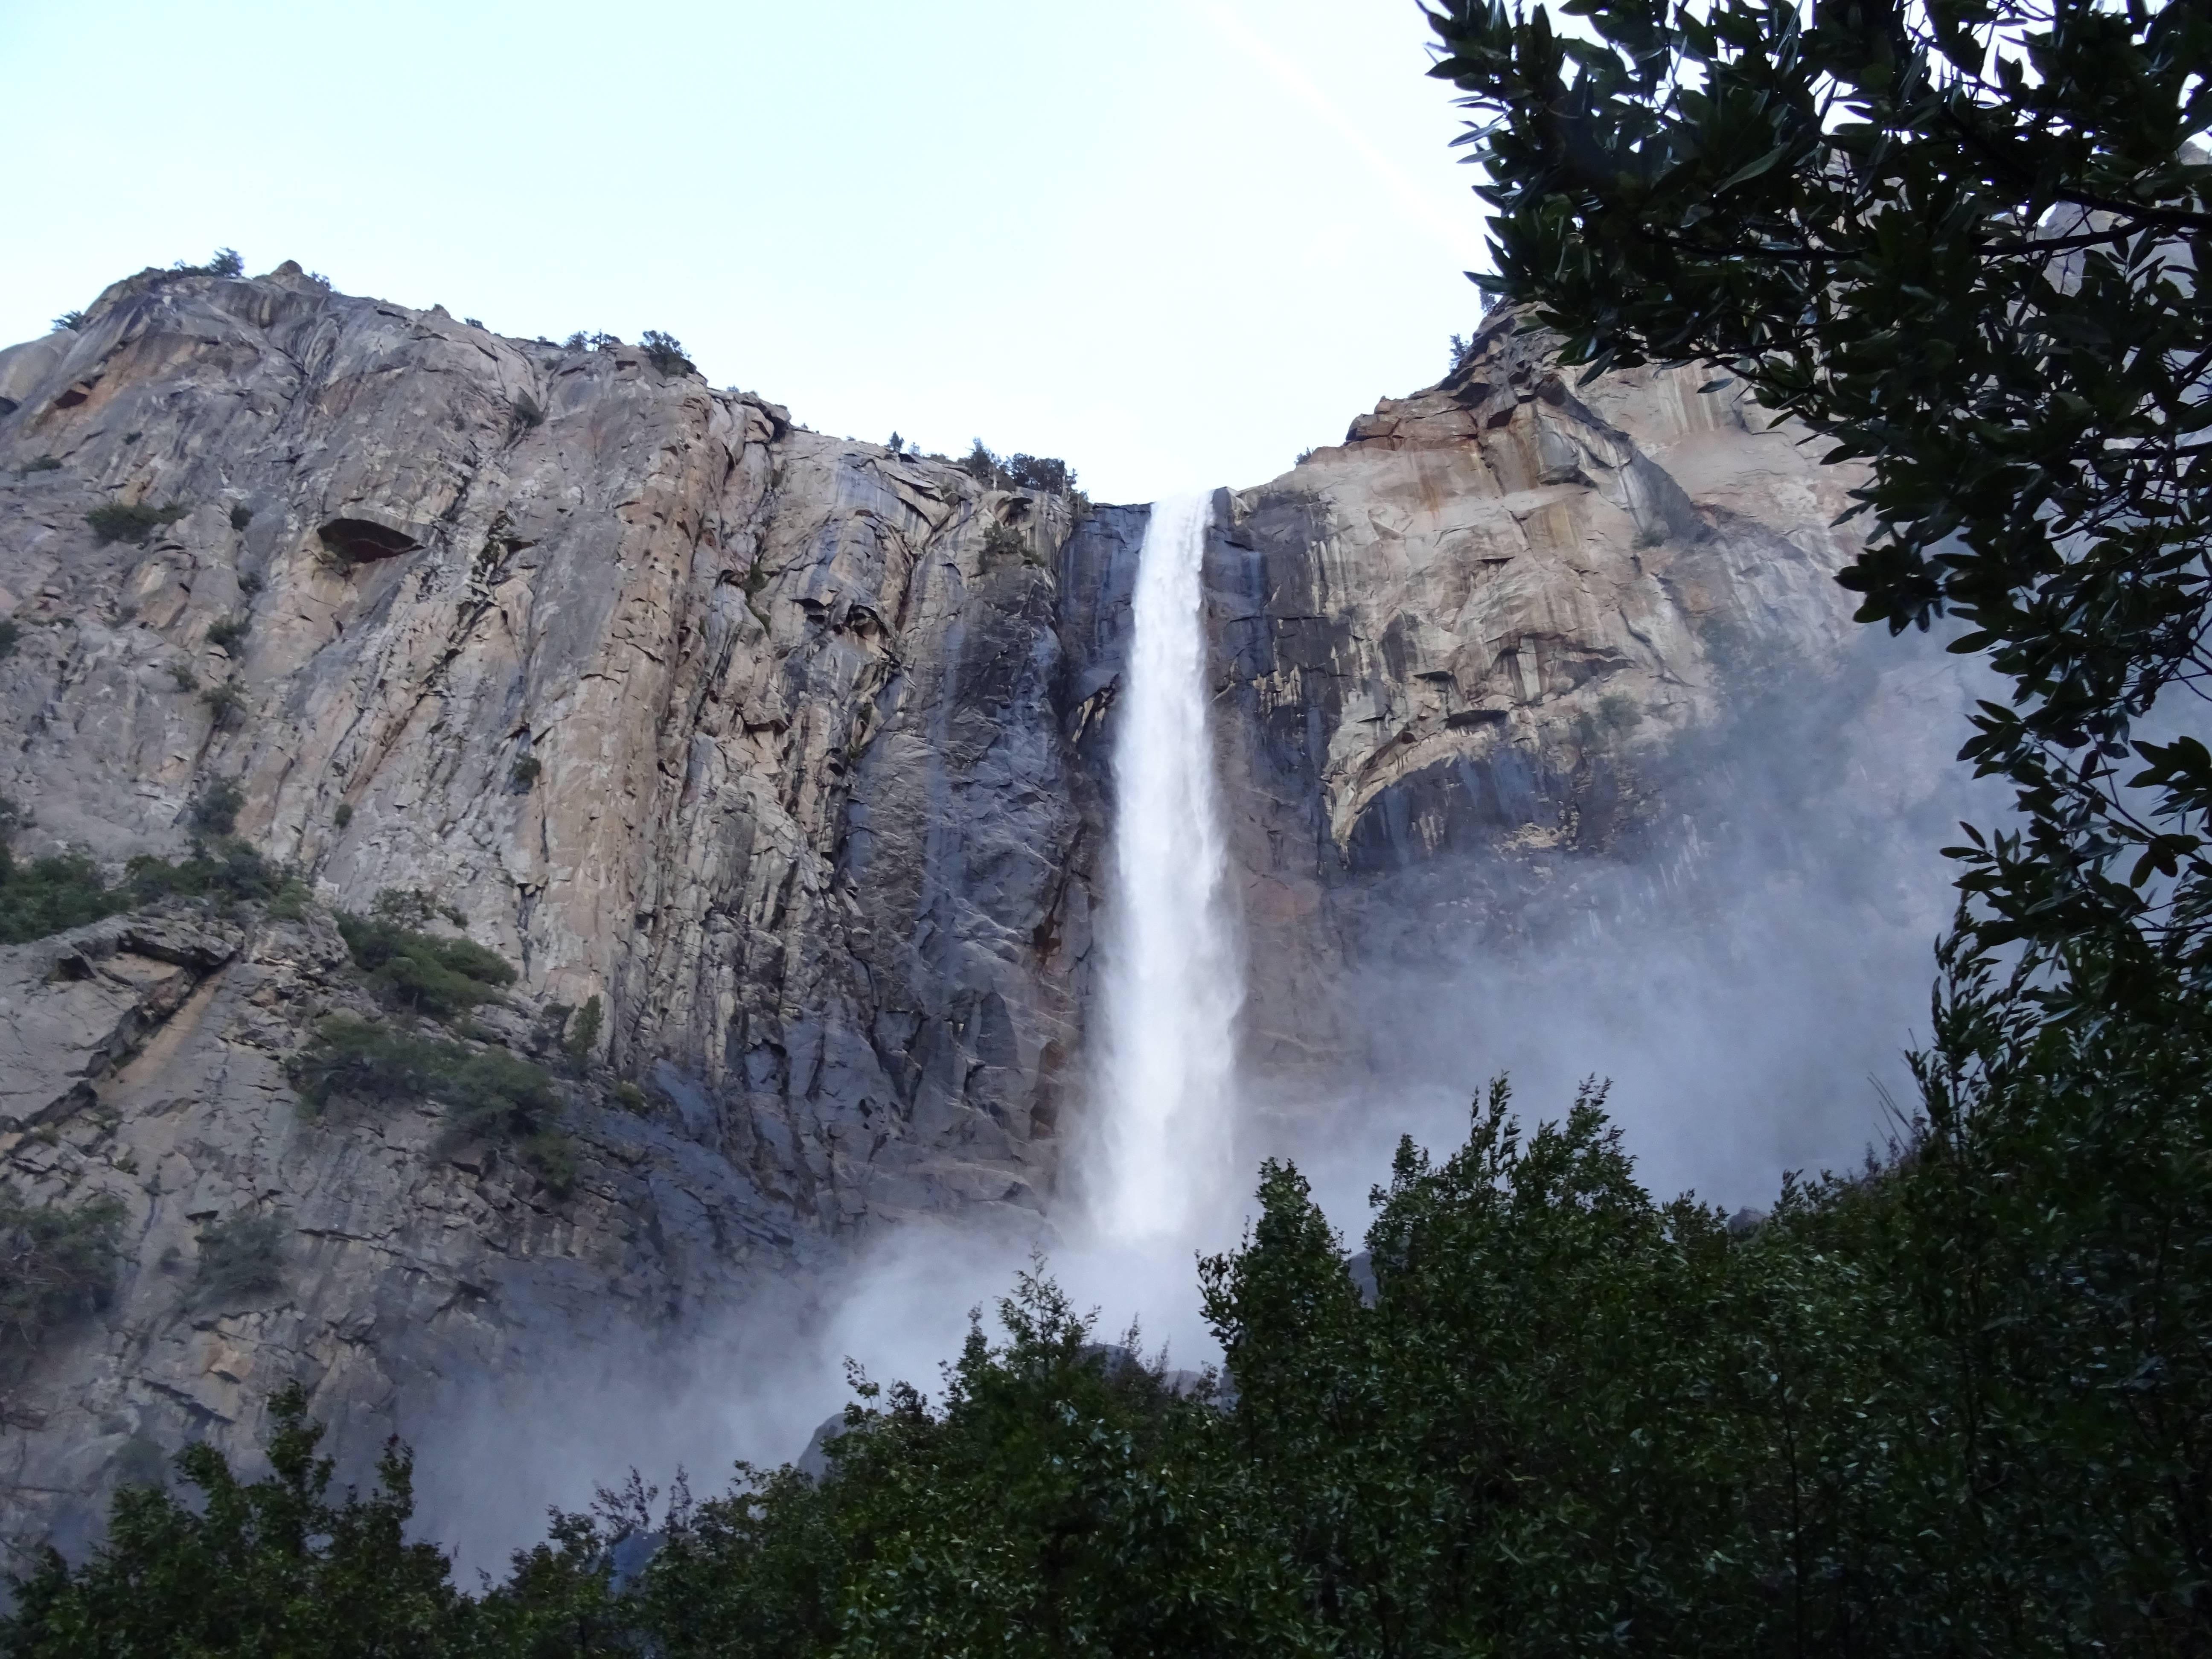 Photo 3: Yosemite park